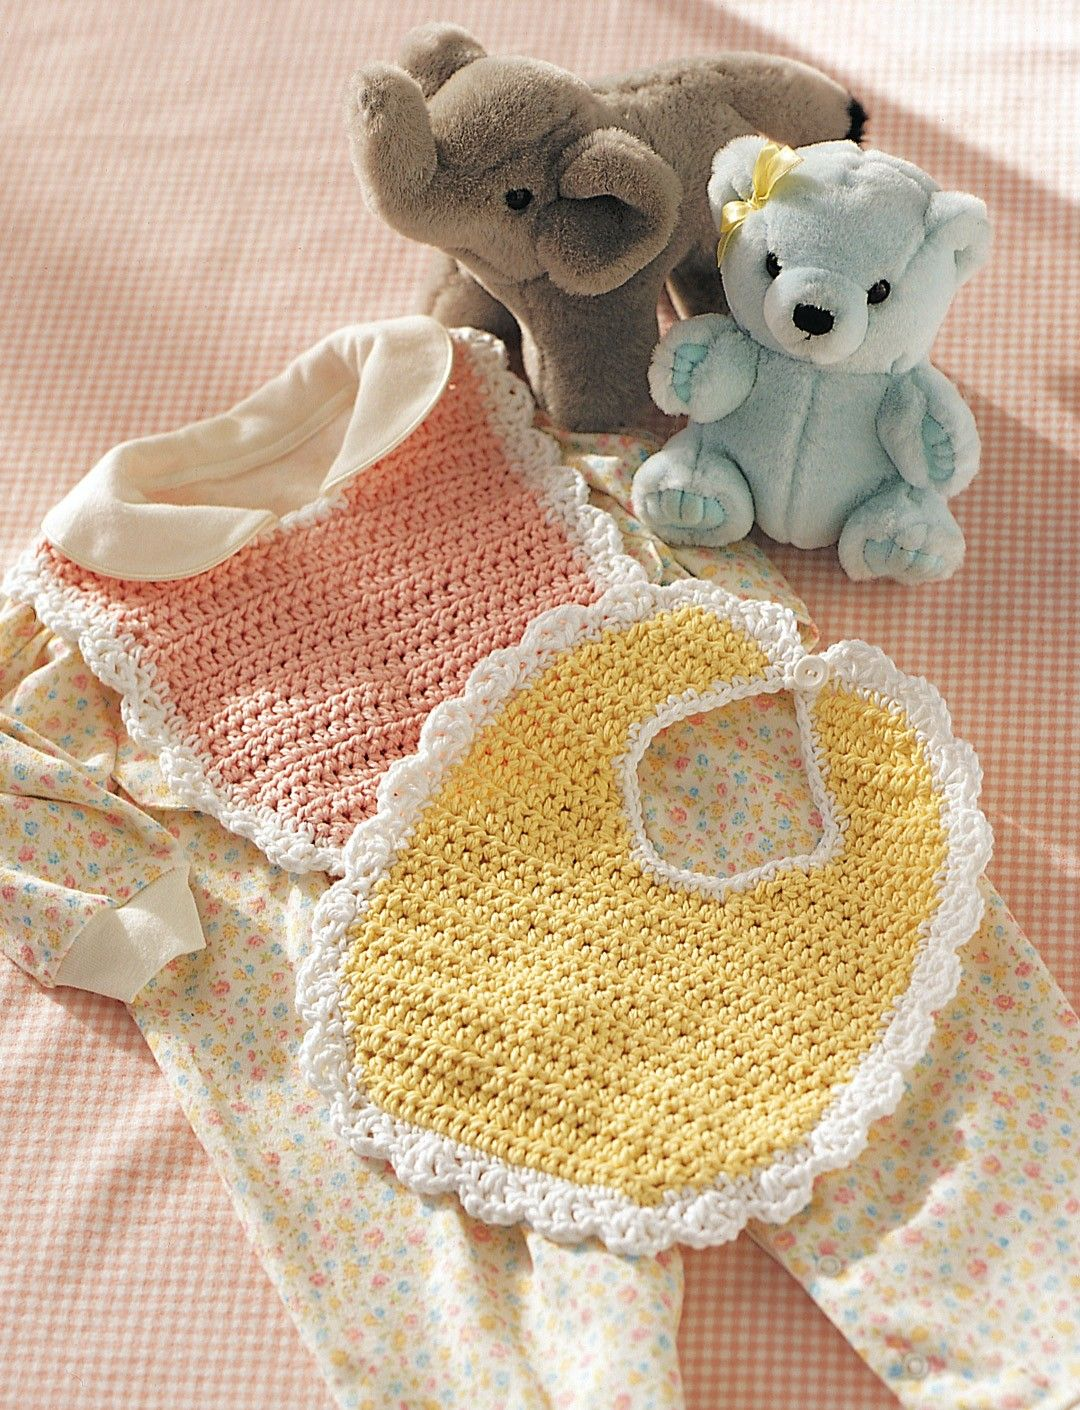 Baby Bib - Free Crochet Pattern - (yarnspirations) | Baby Crochet ...